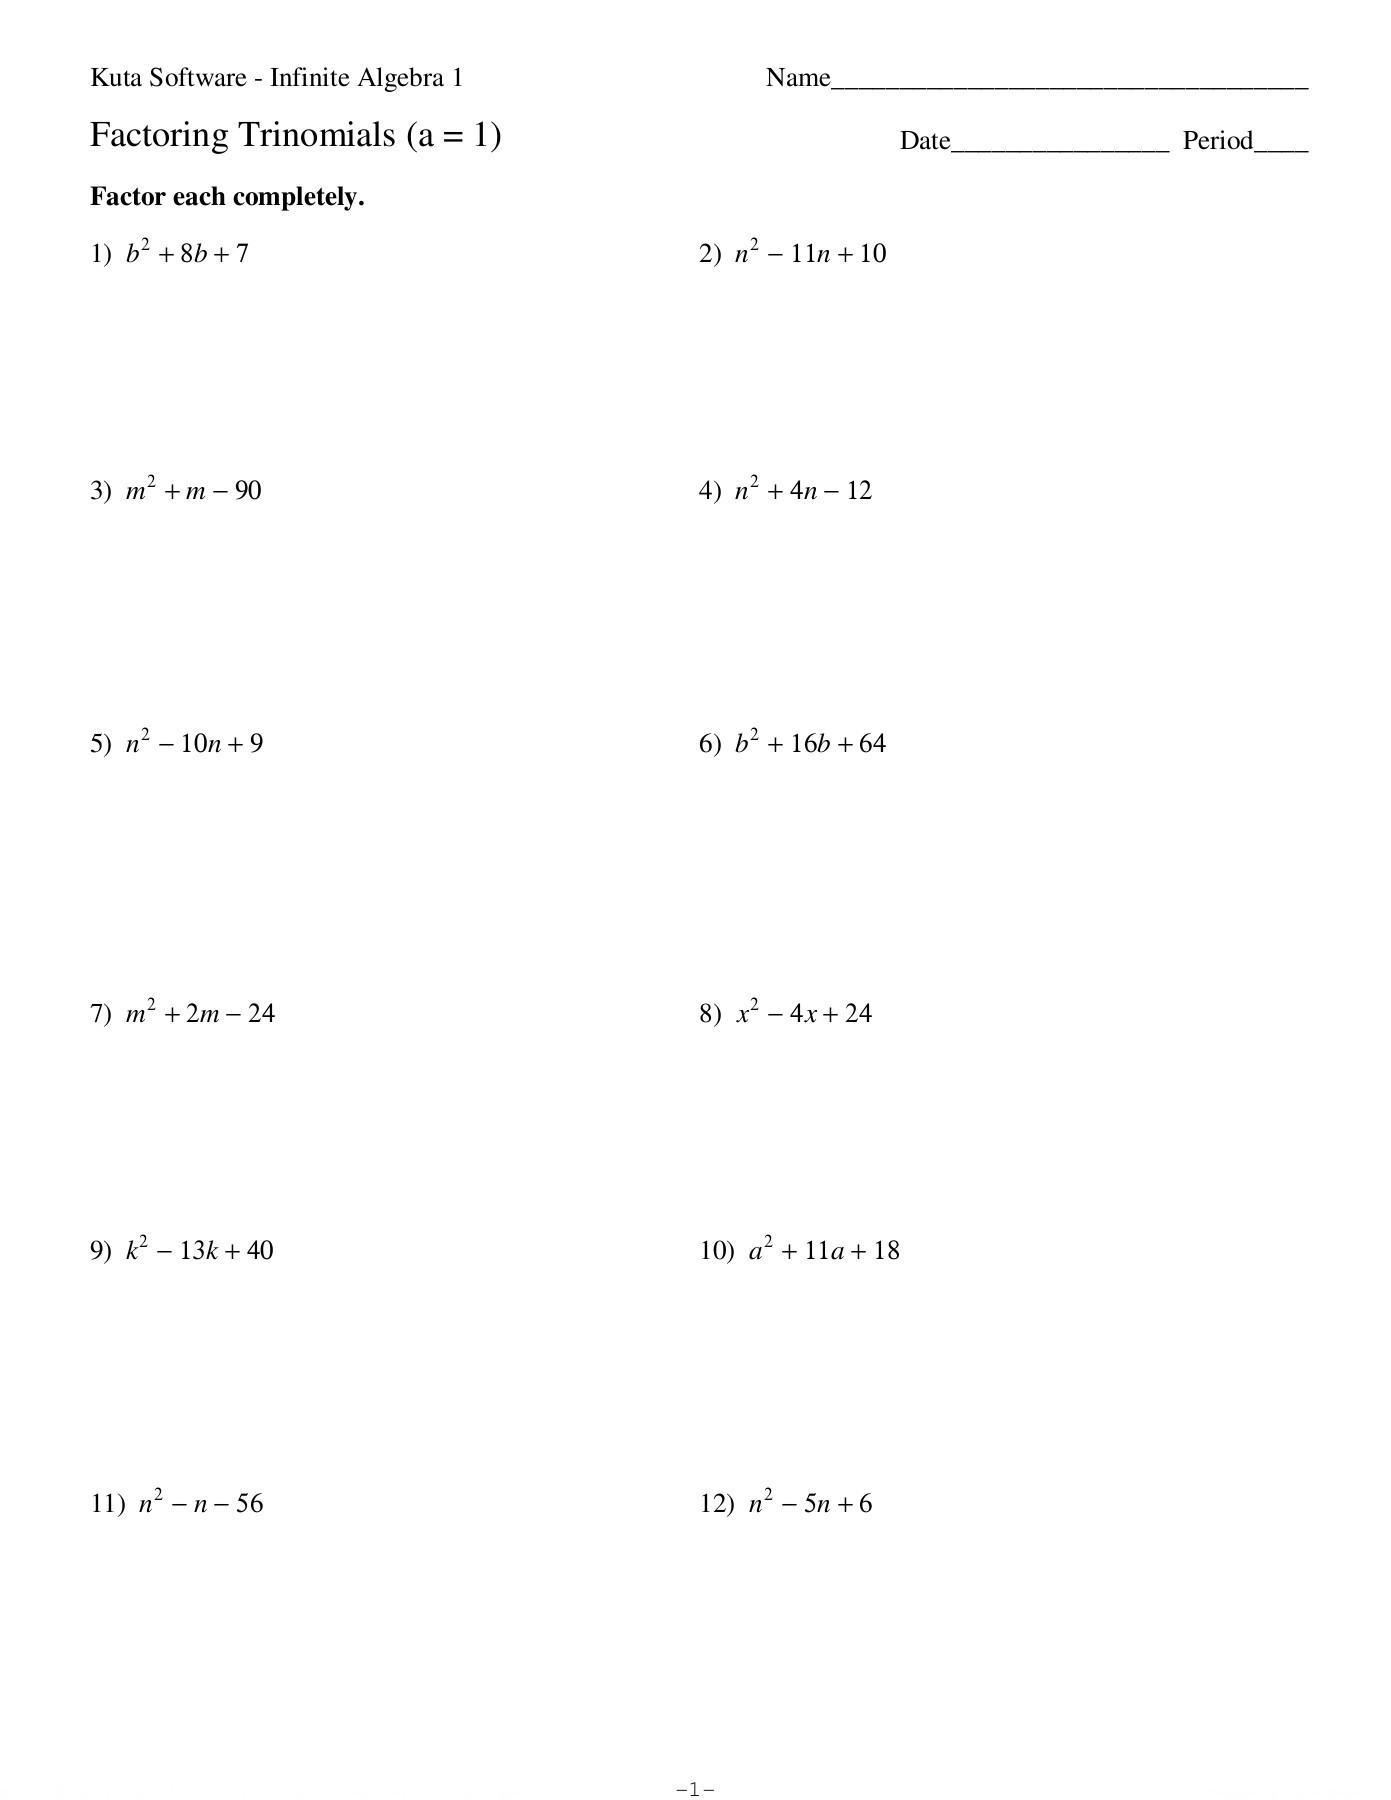 Factoring Trinomials Worksheet Algebra 2 Factoring Trinomials A = 1 Date Period Kuta software Llc